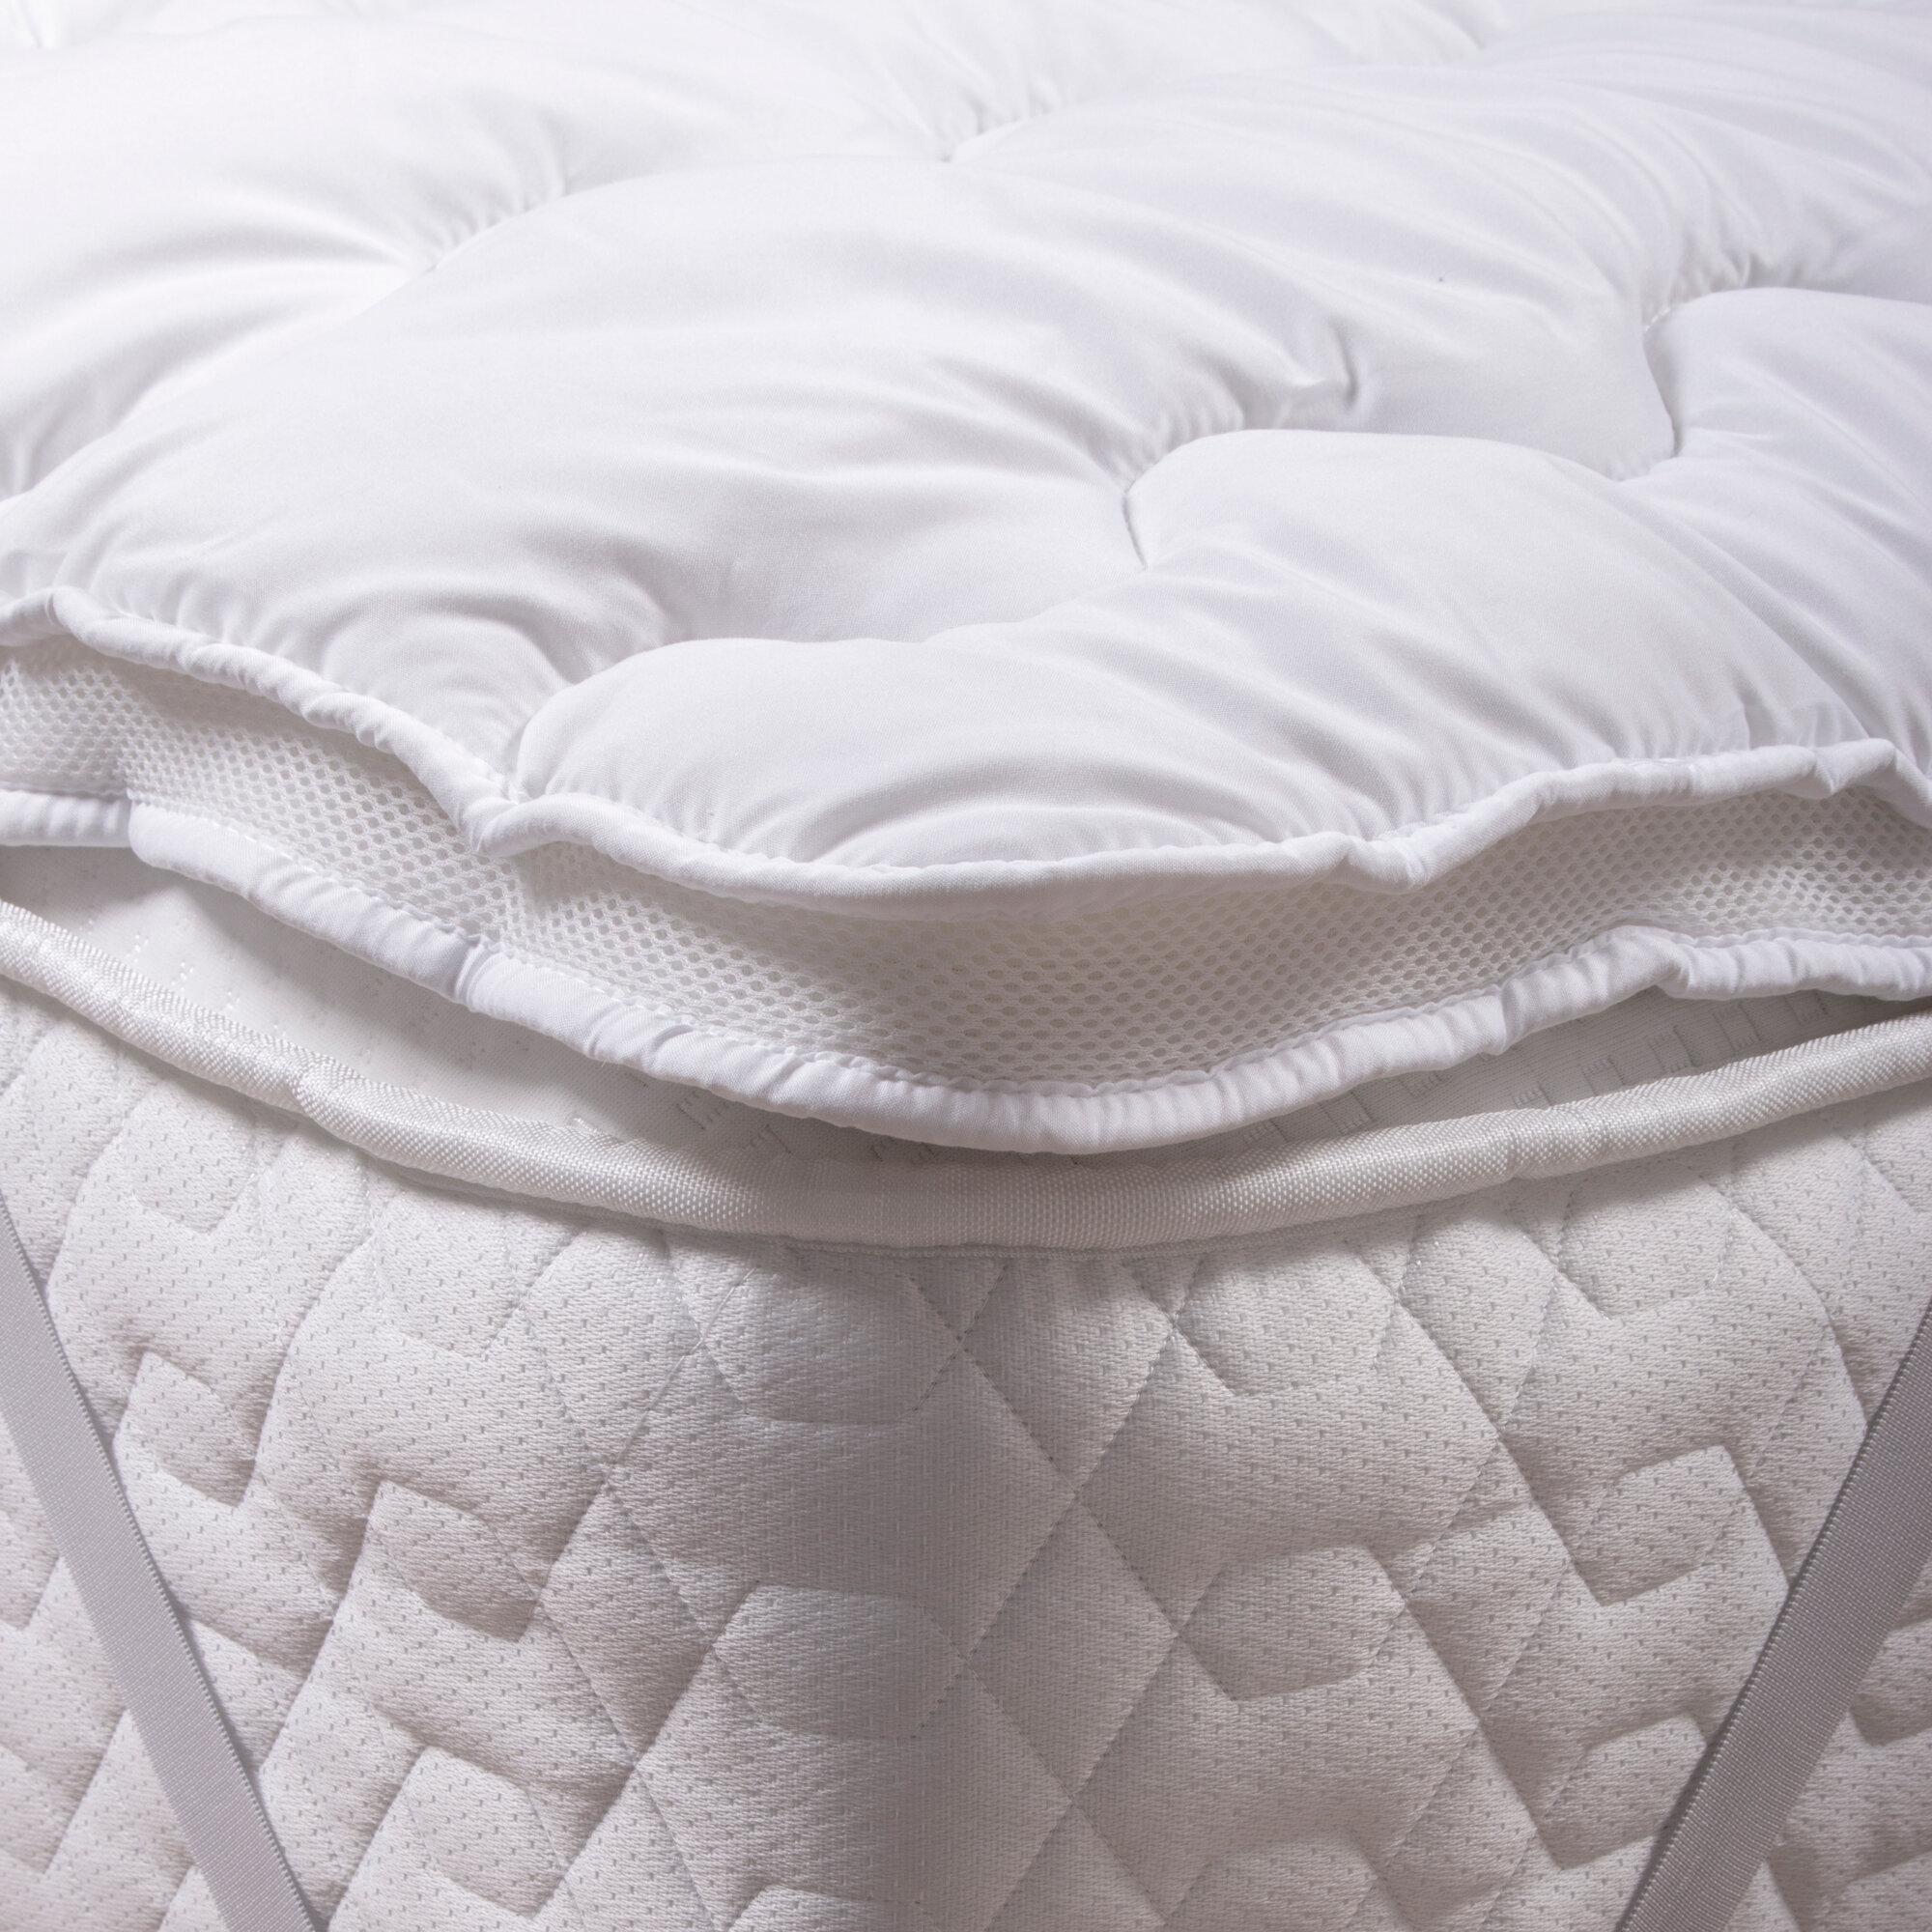 silent night air max mattress topper single